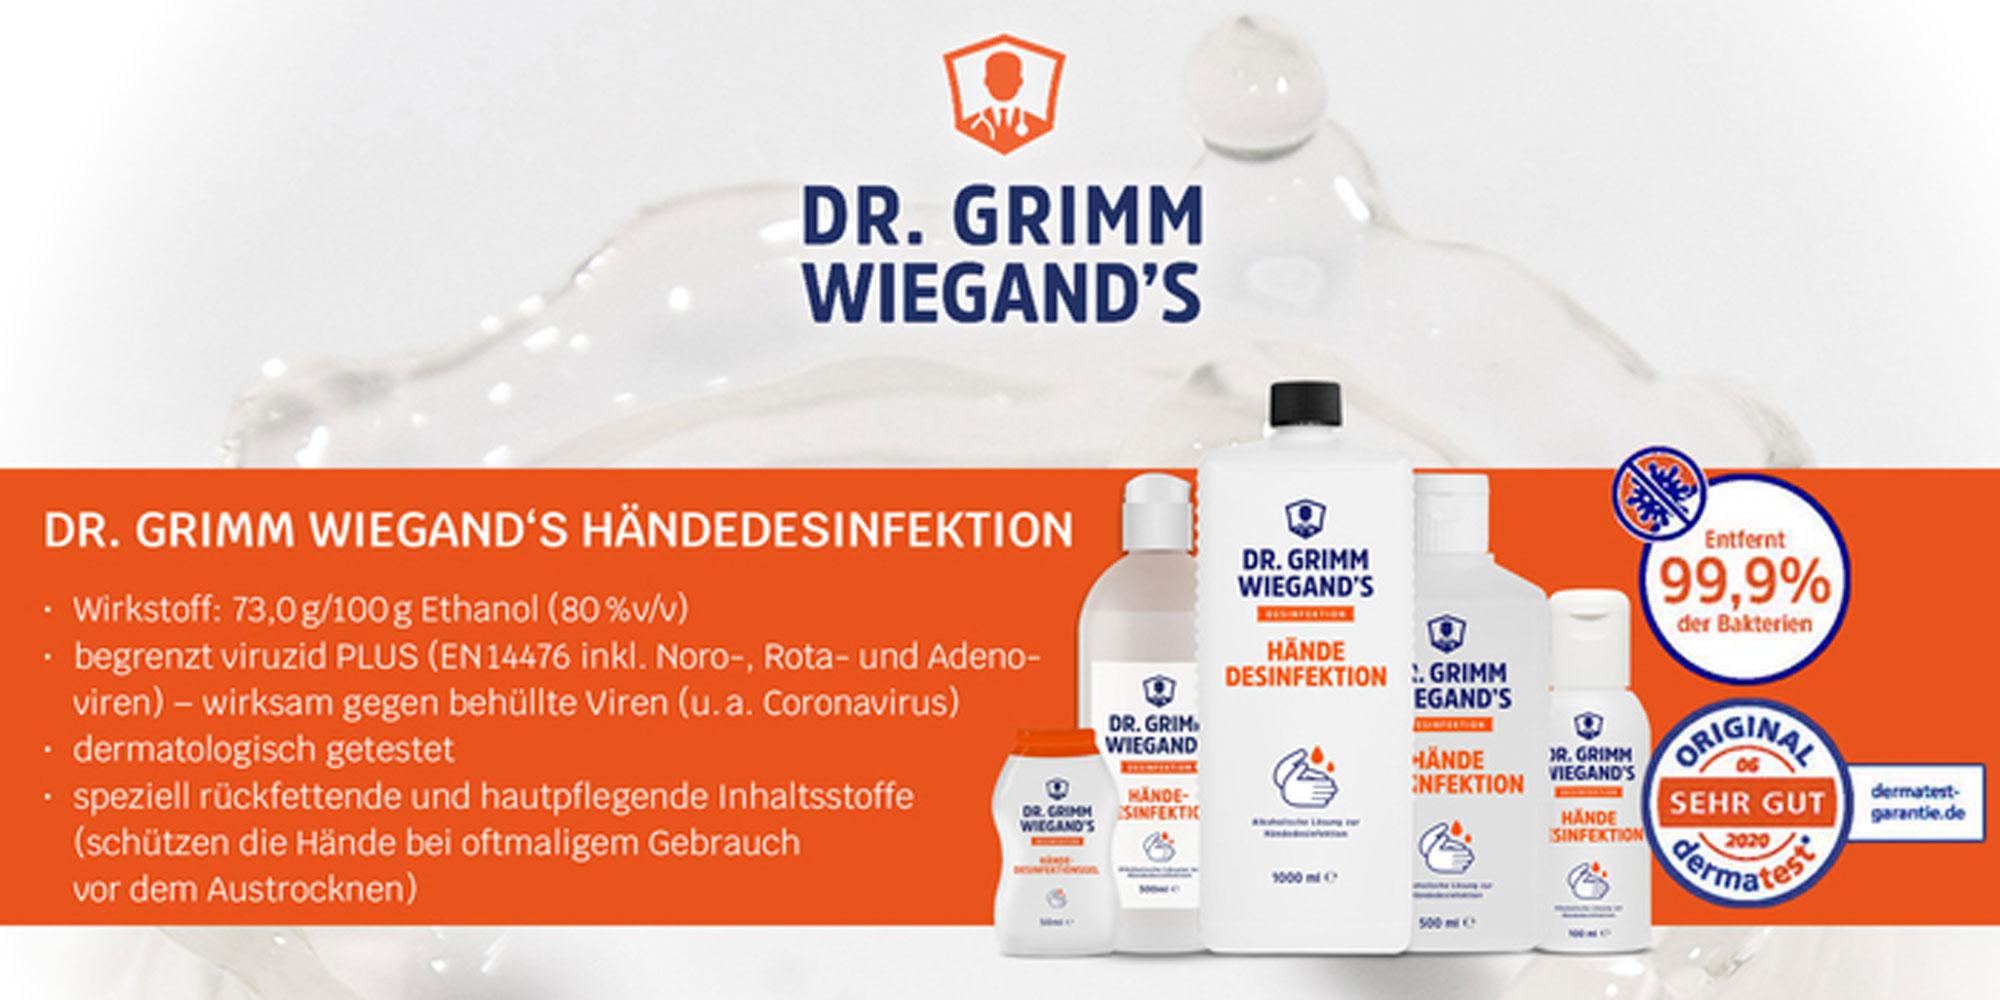 Haendedesinfektionsmittel - Flaechendesinfektionsmittel kaufen